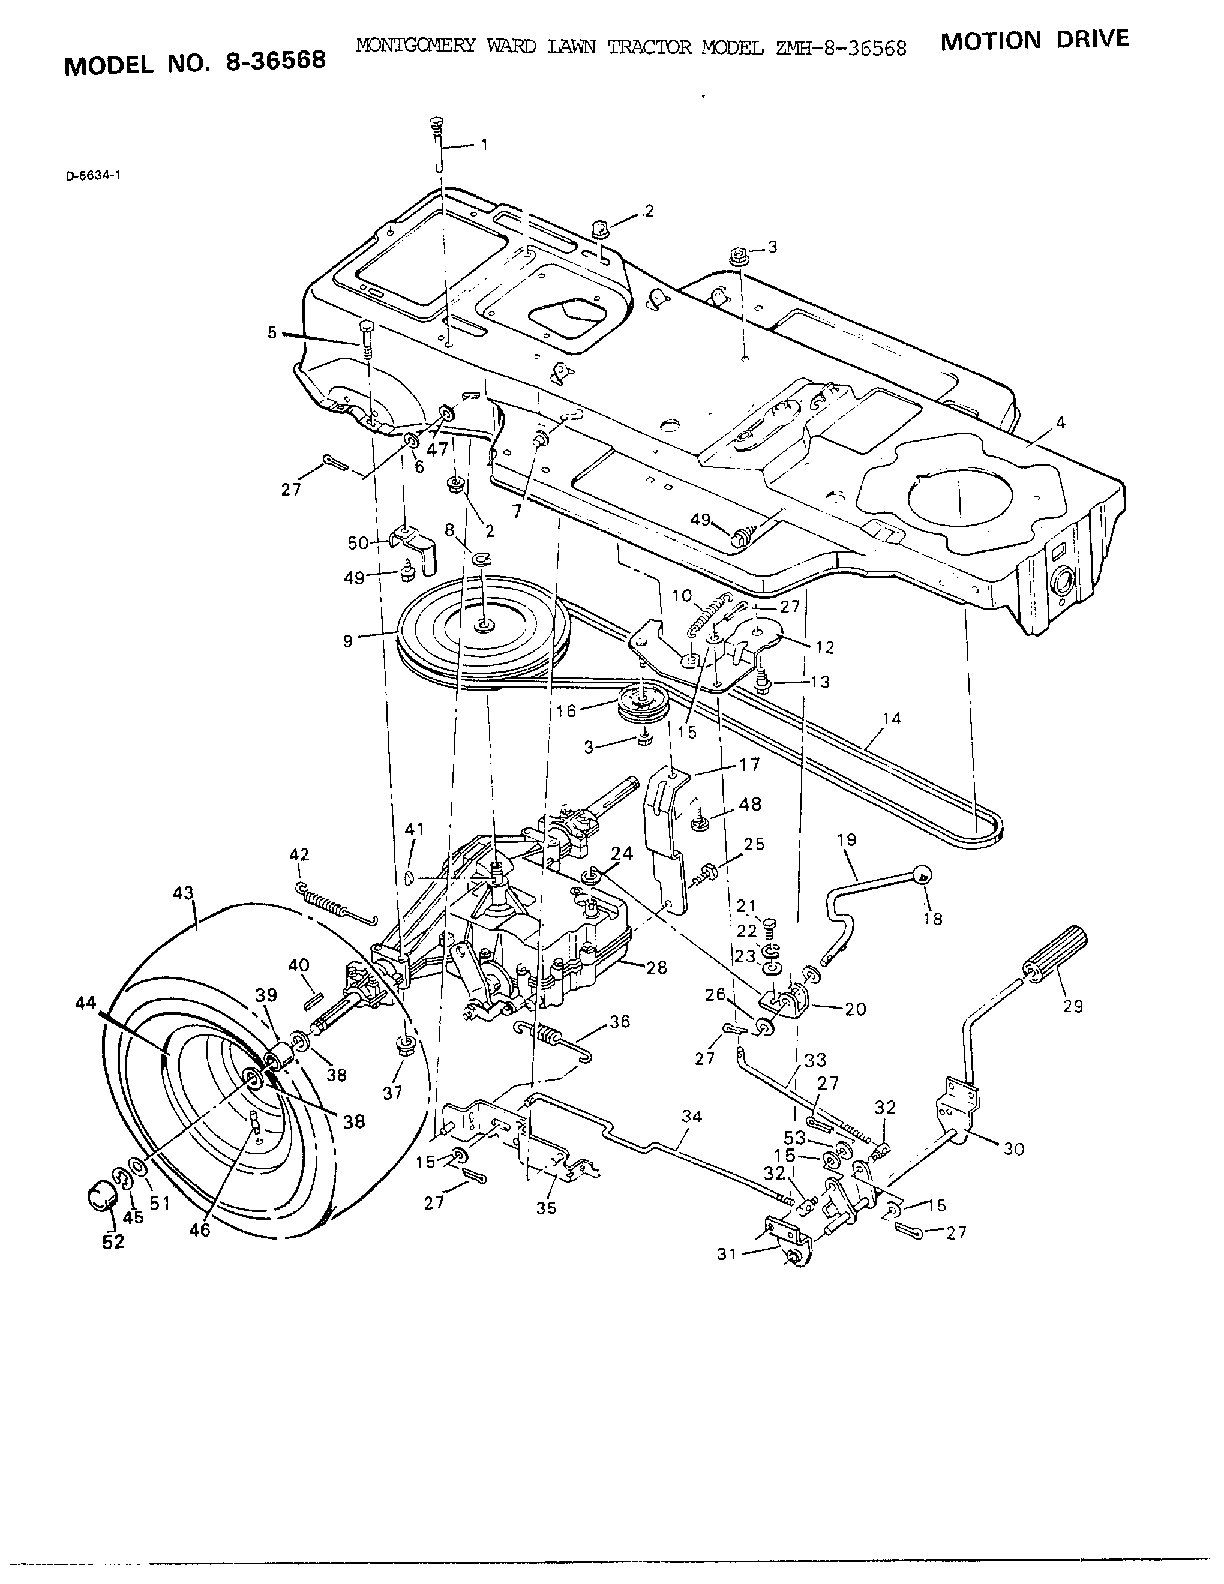 Murray 40507x8c Wiring Diagram - 1999 Gmc Sierra Wiring Diagram for Wiring  Diagram Schematics | Murray 40507x8c Wiring Diagram |  | Wiring Diagram Schematics